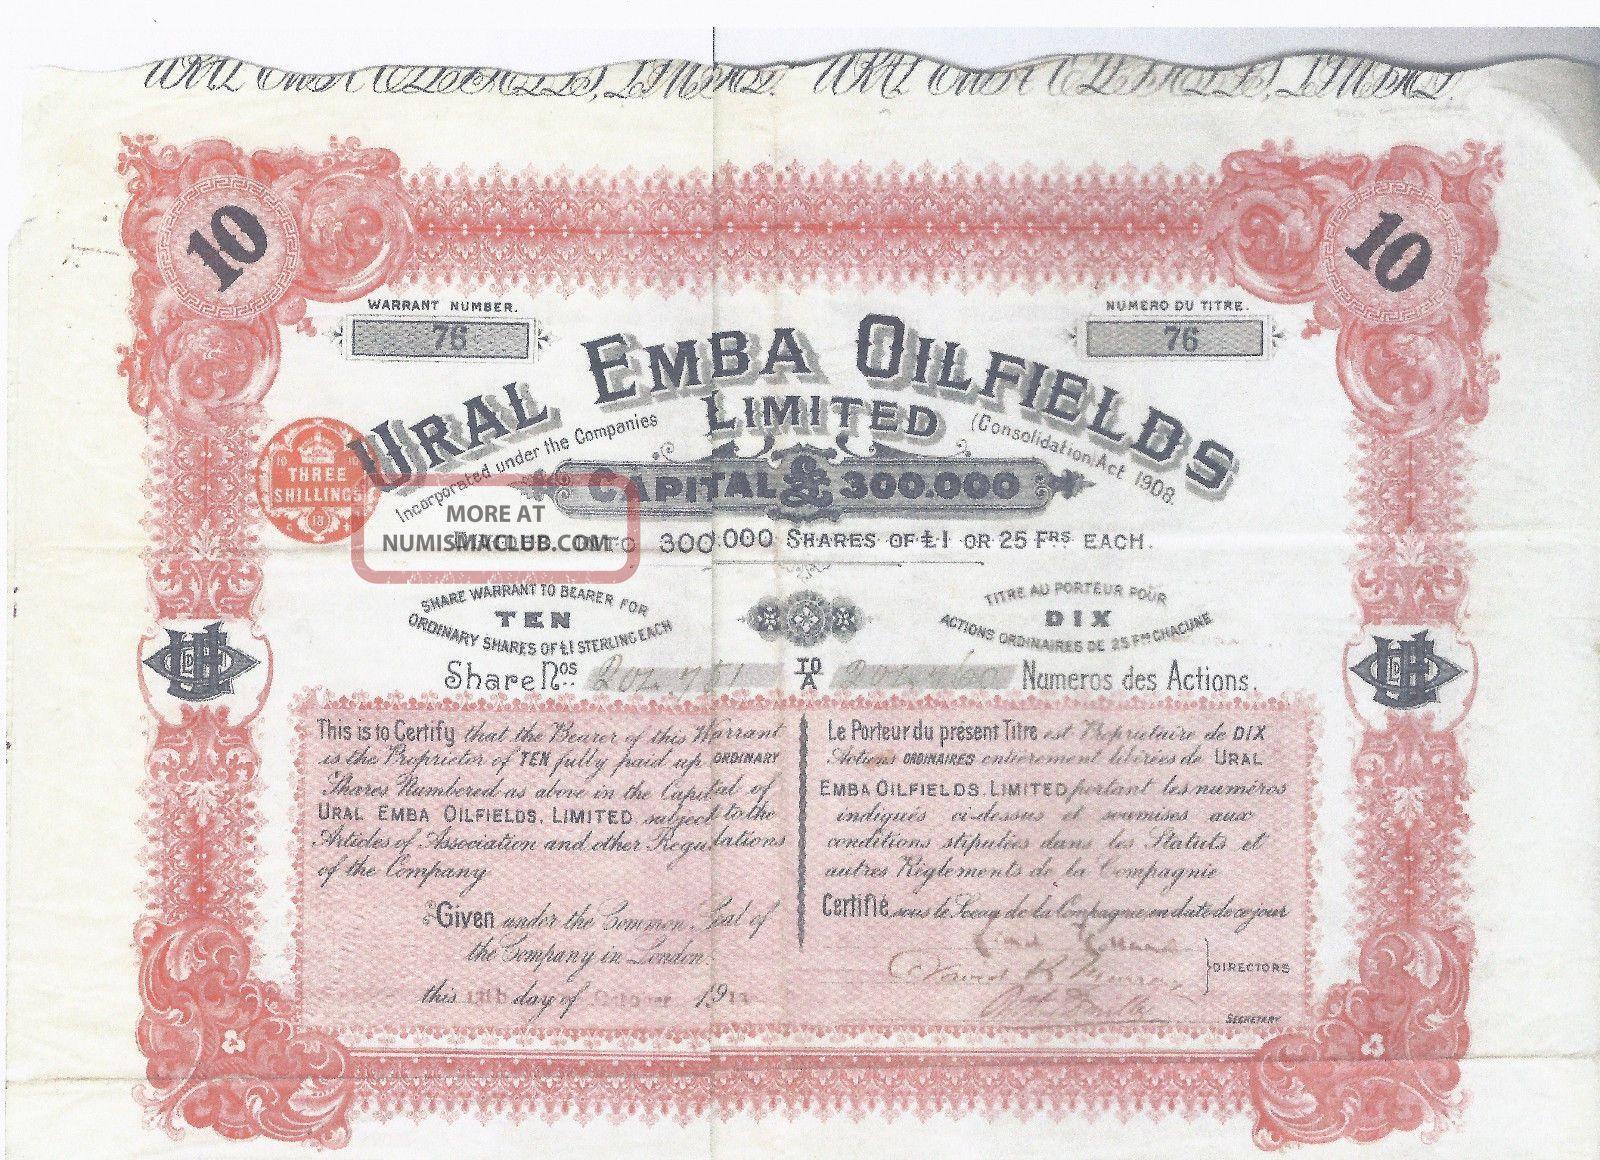 Russia Kazakhstan Ural Emba Oil Fields Stock Certificate - October 13,  1913 Stocks & Bonds, Scripophily photo